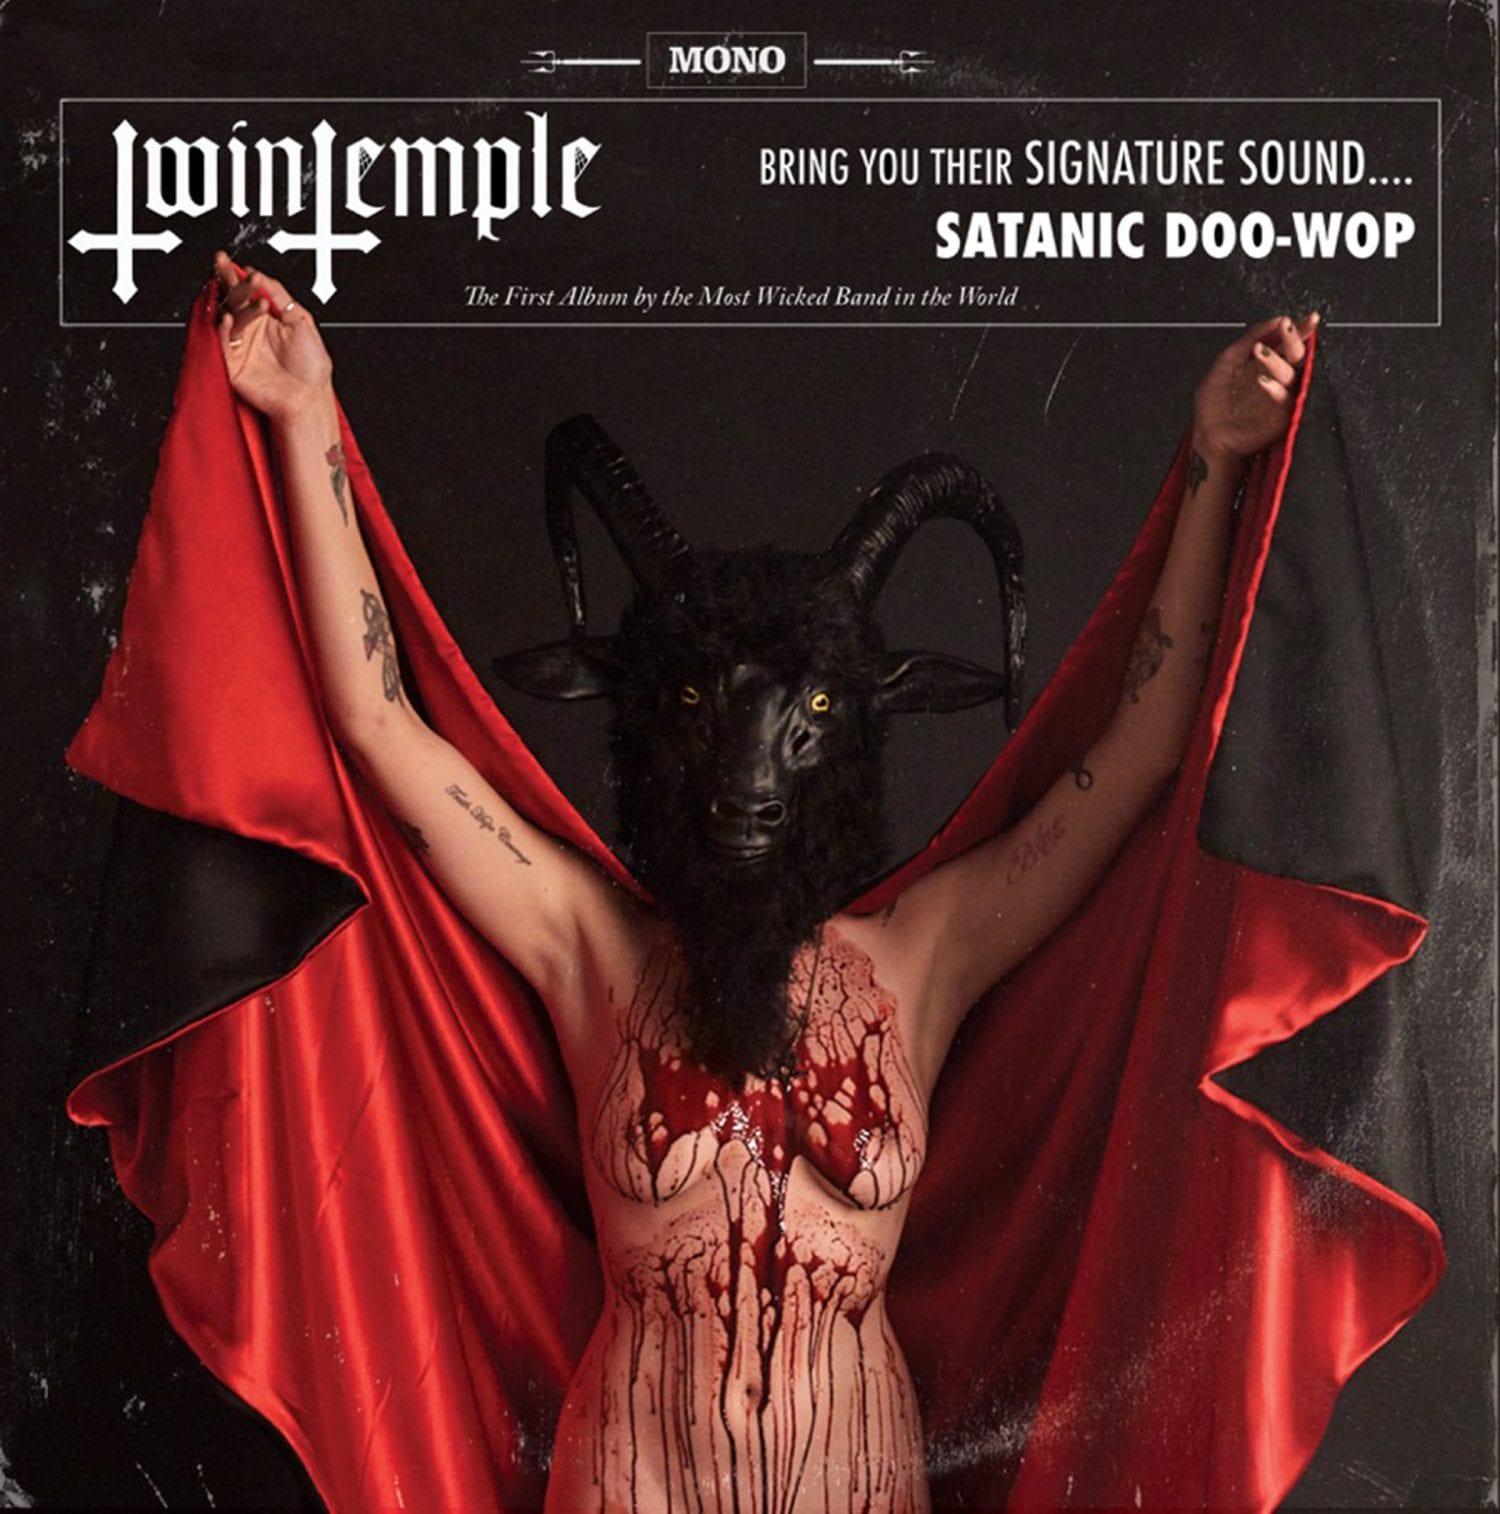 Satanic sex magick rituals video